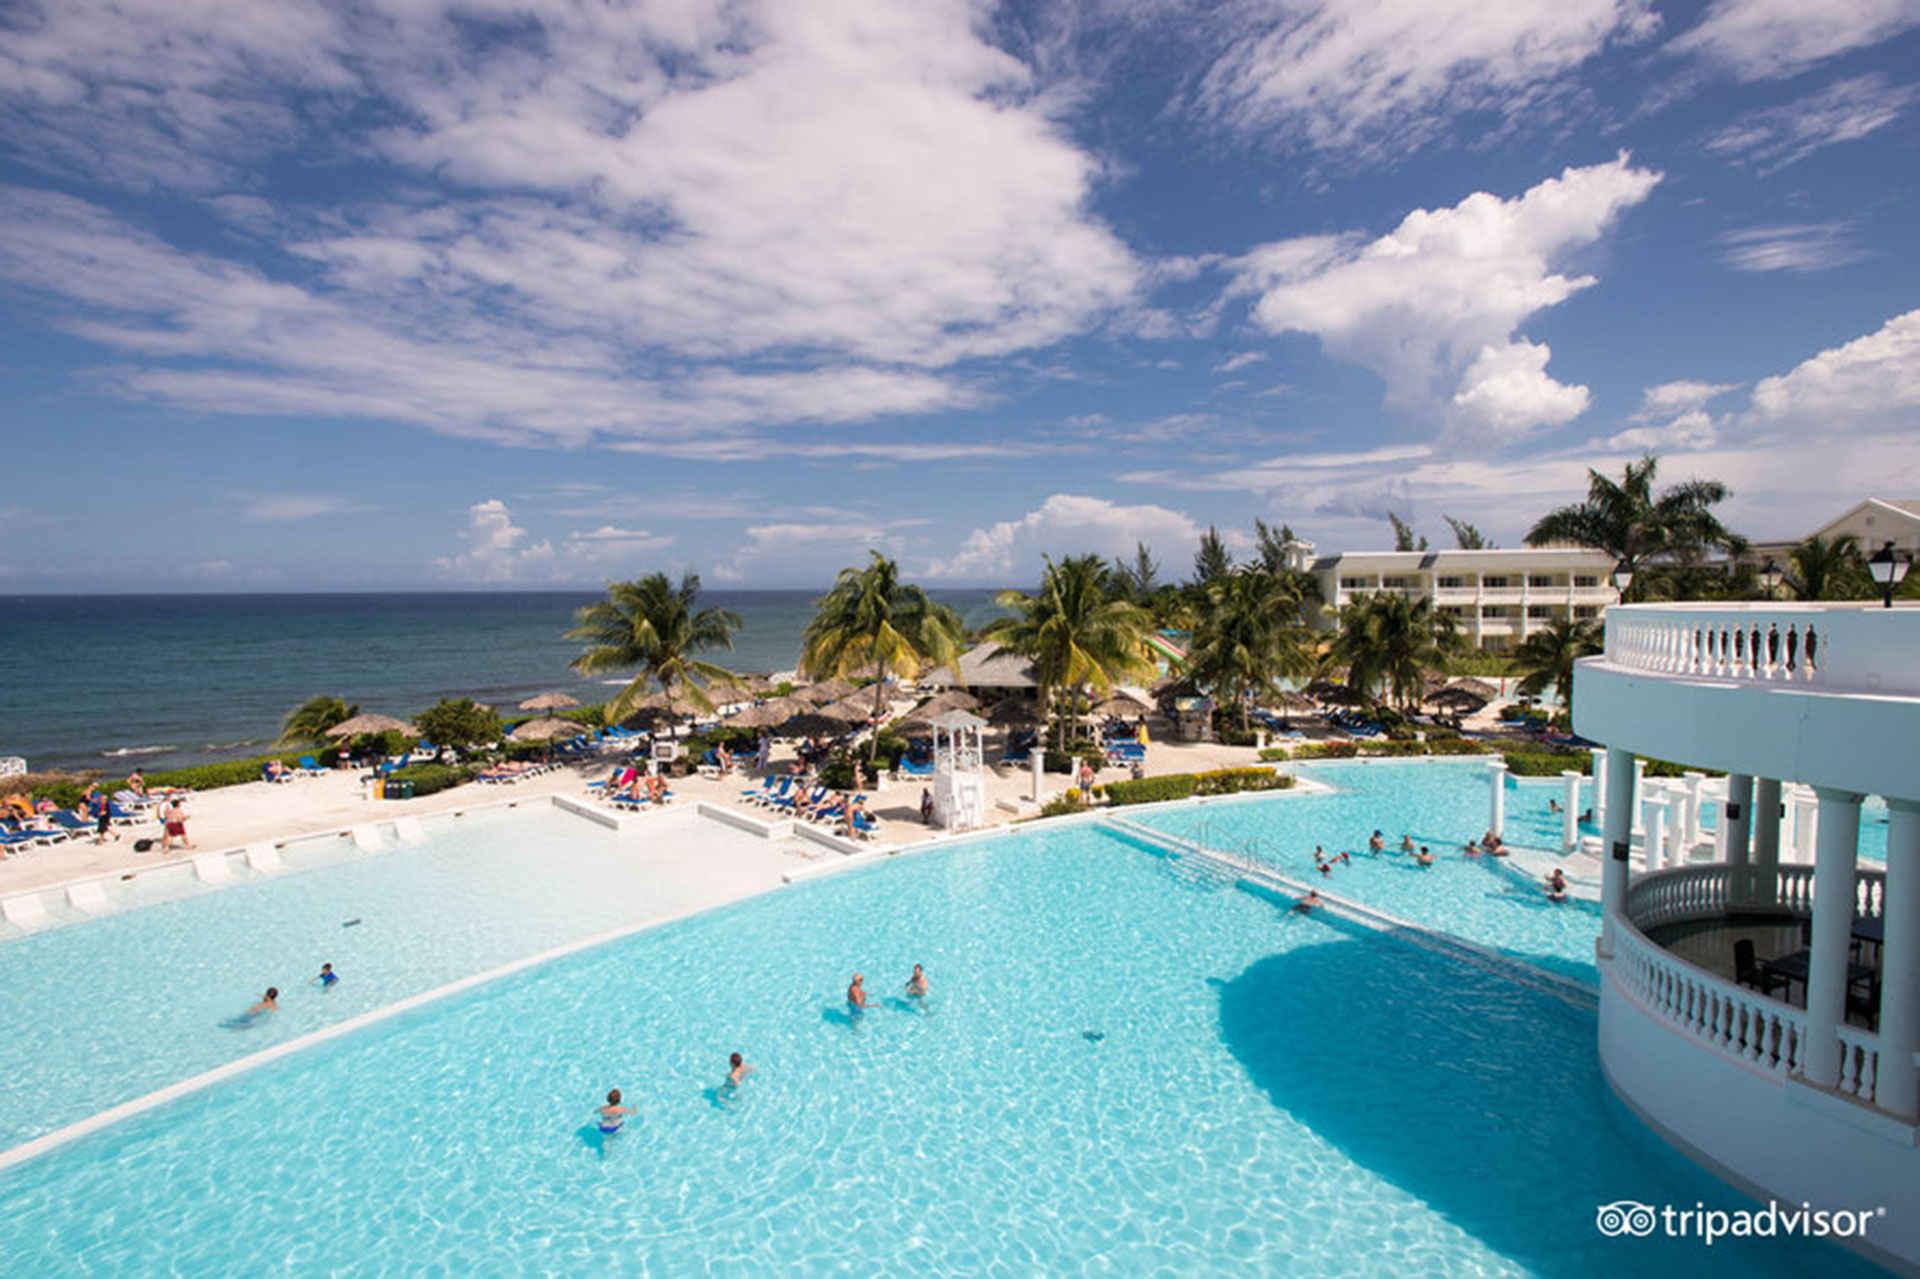 Grand Palladium Jamaica Resort & Spa; Courtesy of Grand Palladium Jamaica Resort & Spa